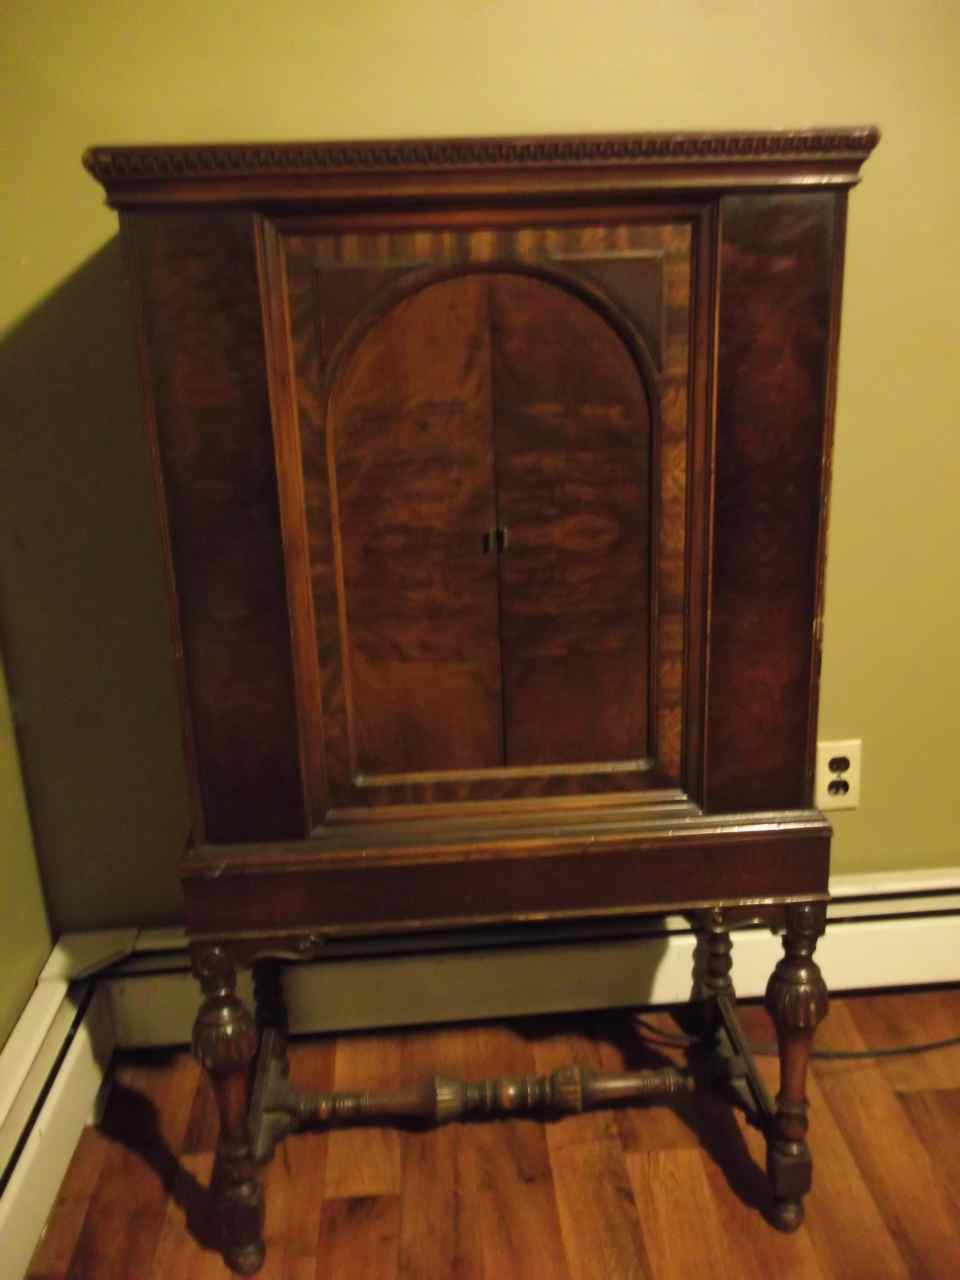 Beau 1940s Wooden Philco Radio Cabinet